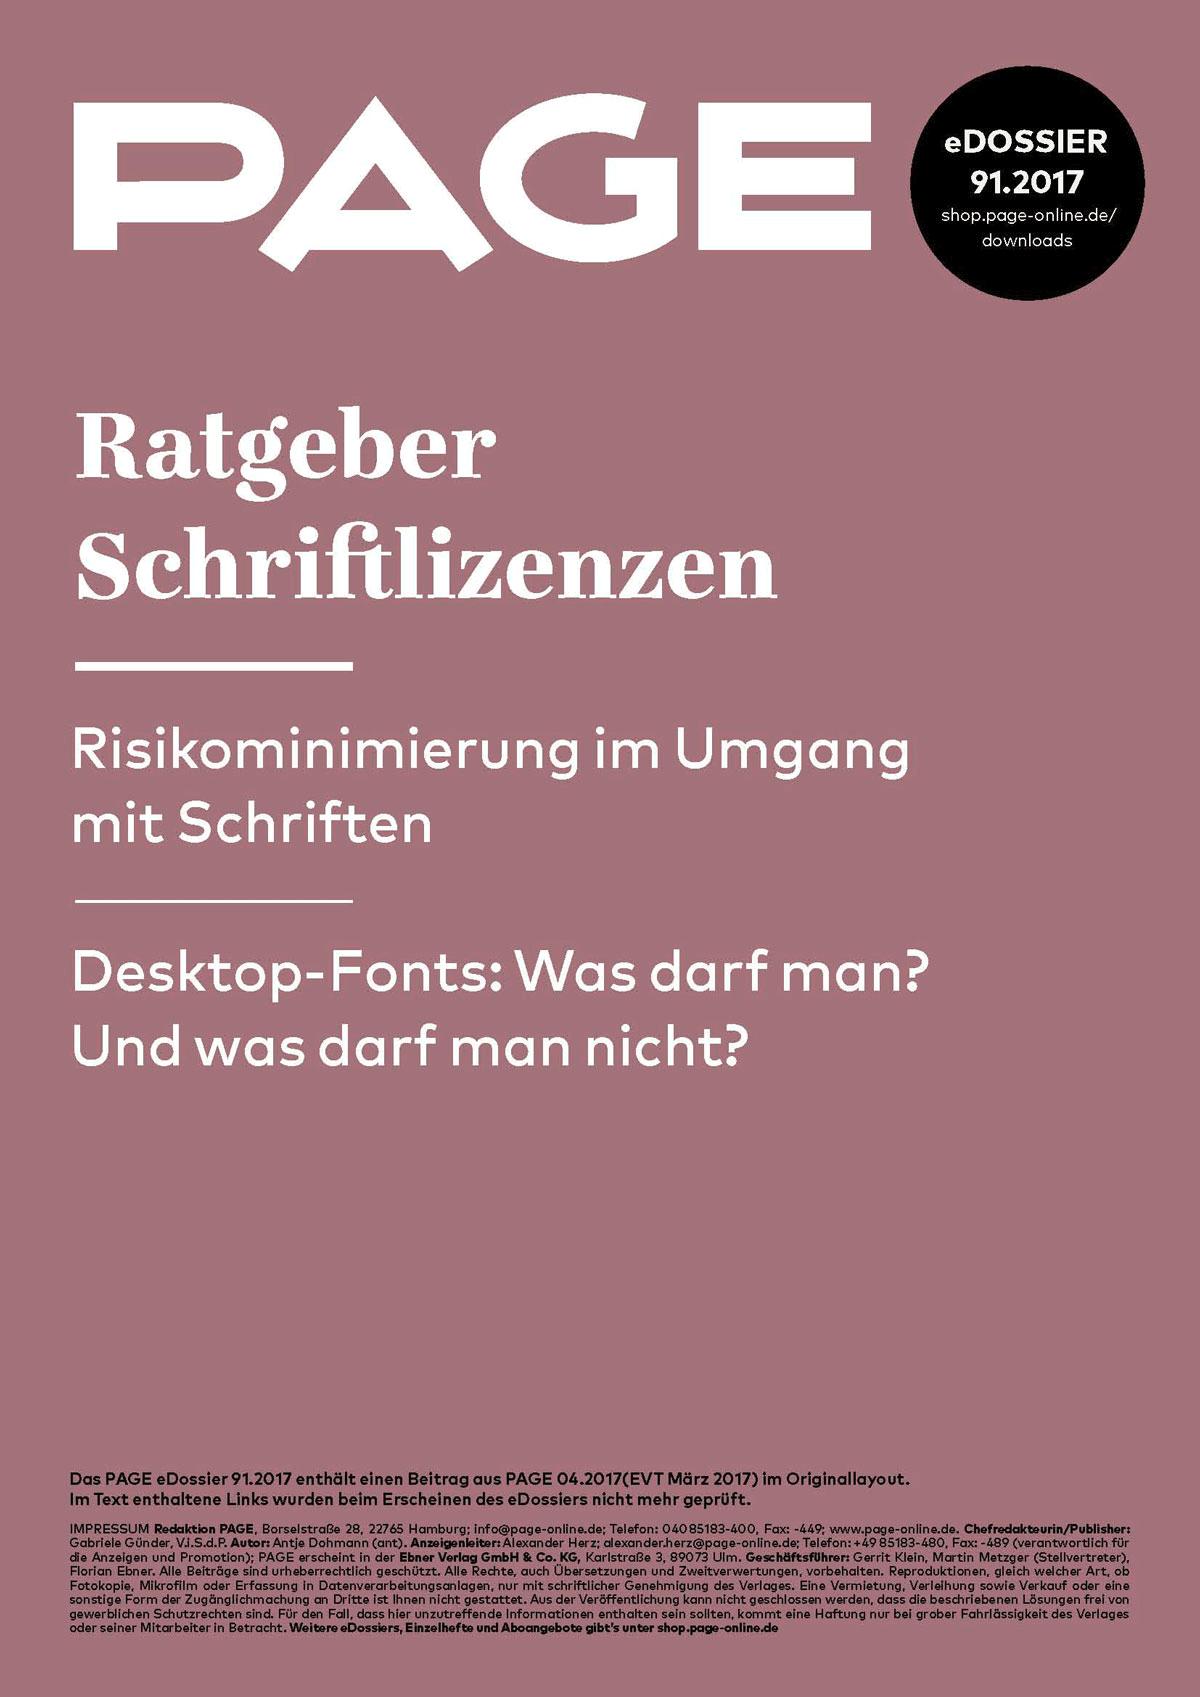 Typografie, Free Fonts, Webfonts, Fonts, Schriftarten